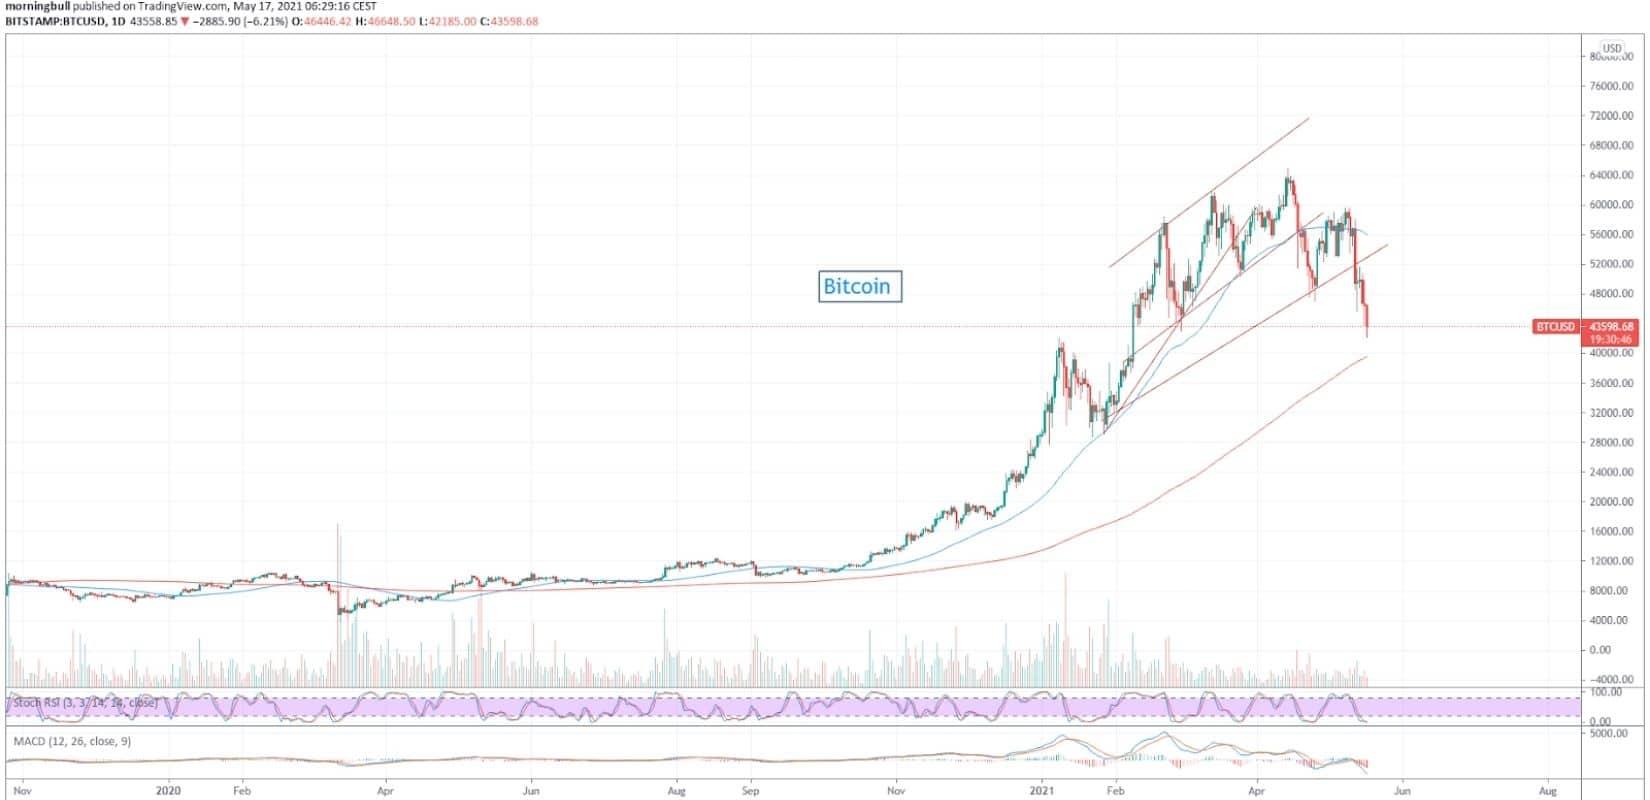 morningbull semaine 20 - graphique du bitcoin